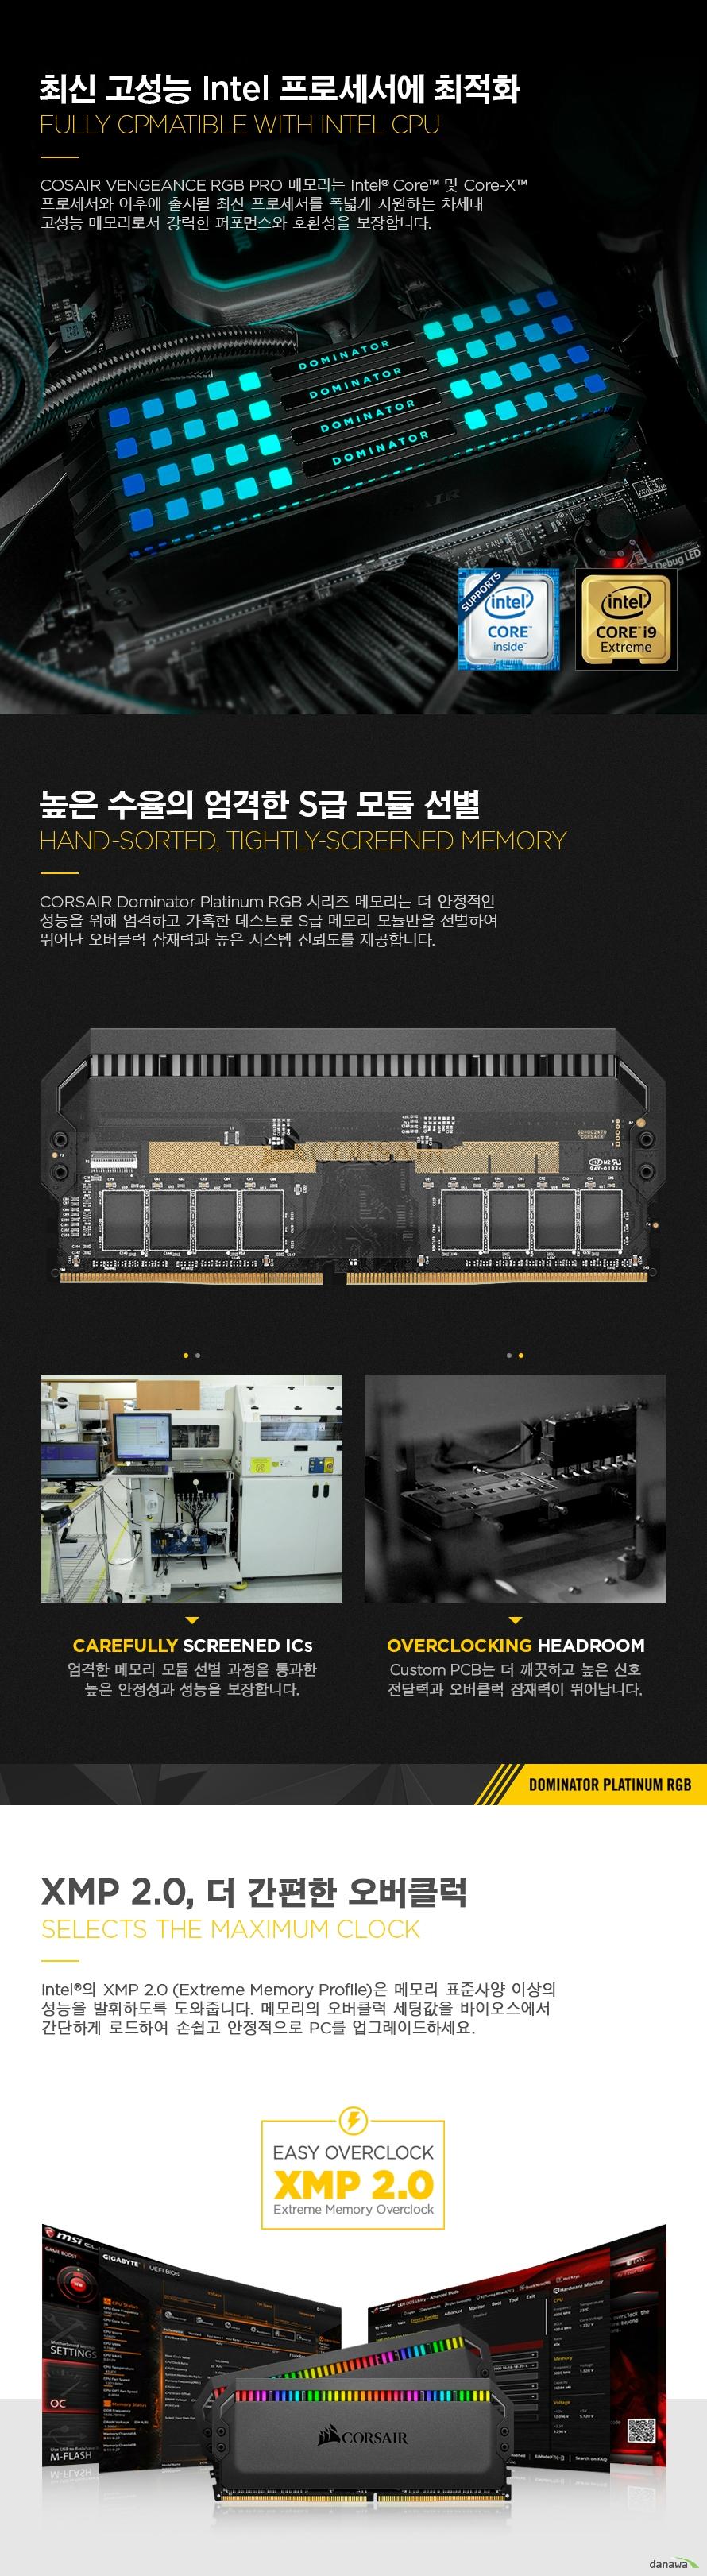 CORSAIR  DDR4 32G PC4-25600 CL16 Dominator Platinum RGB INTEL (8Gx4)